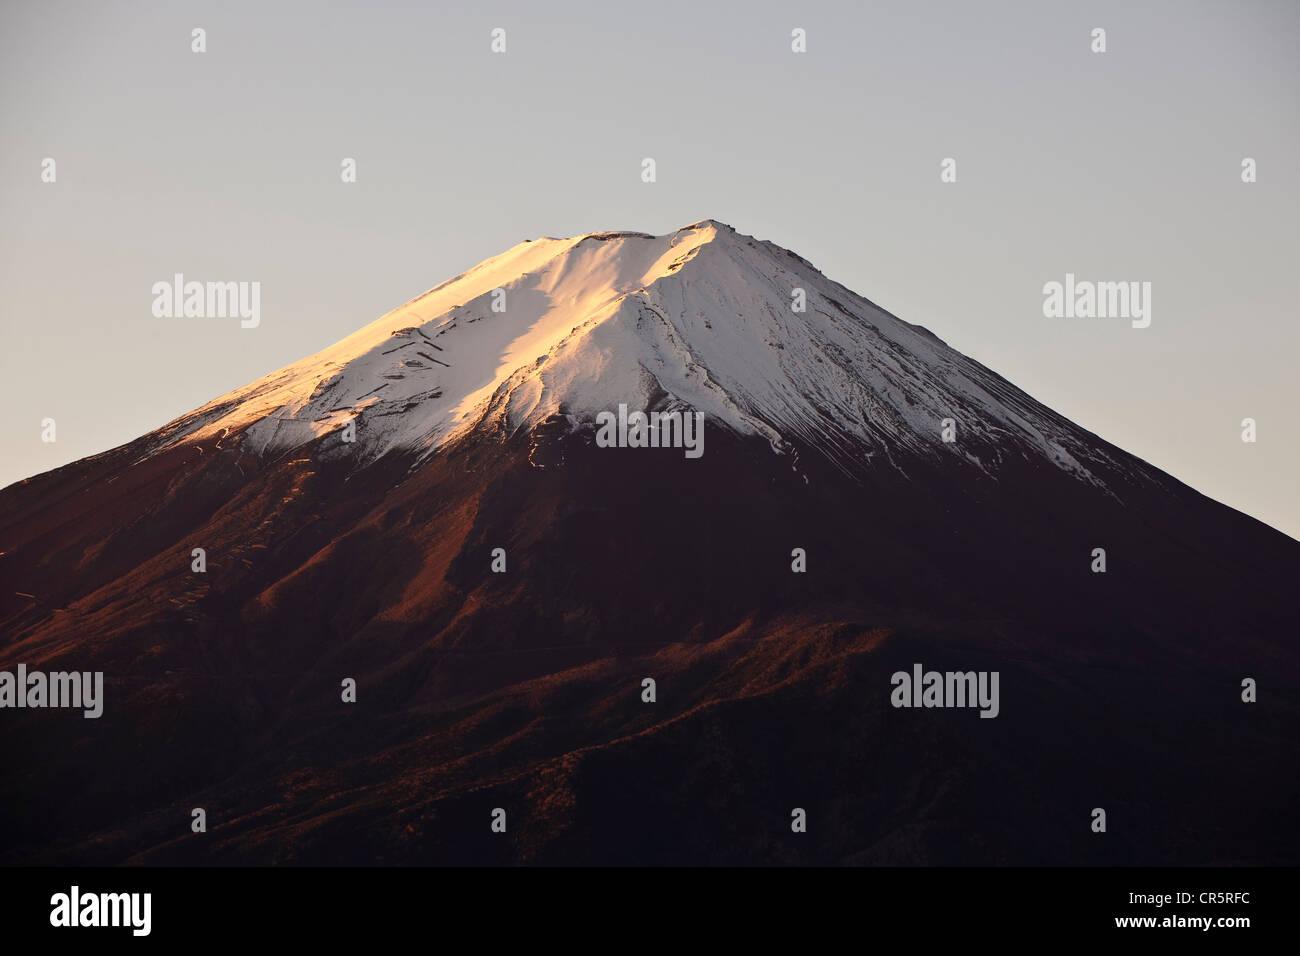 Japan, Honshu Island, Kansai Region, the Mount Fuji (3776m) seen from the banks of the lake Kawaguchiko at sunset - Stock Image